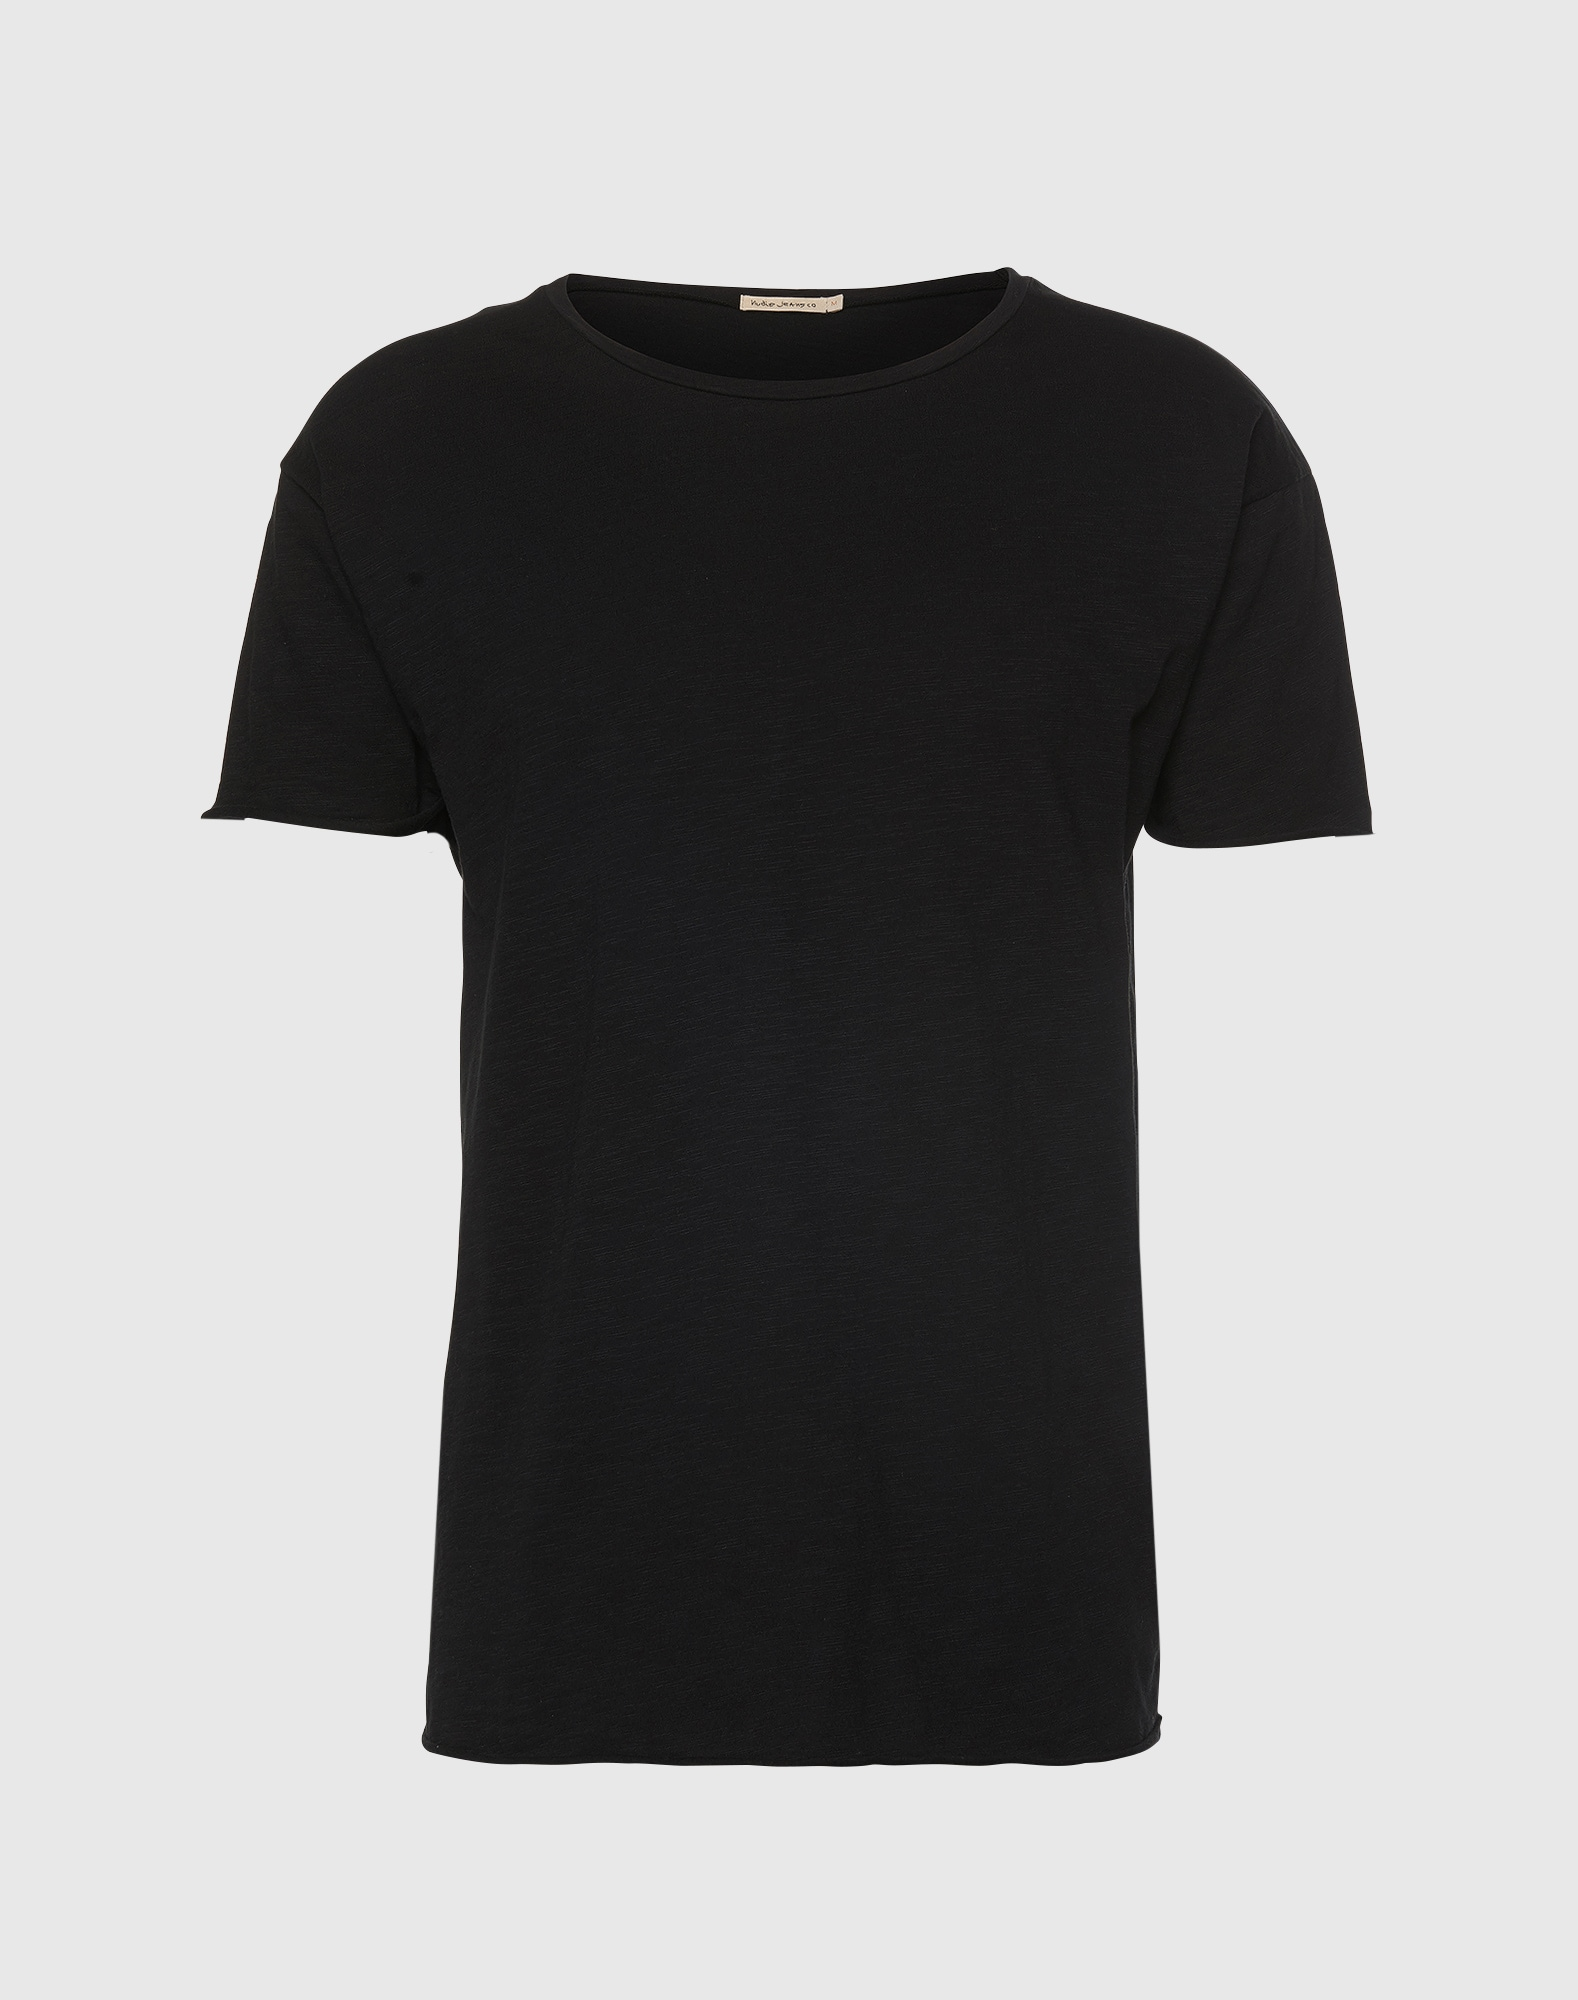 Nudie Jeans Co T-shirt 'Roger Slub'  svart